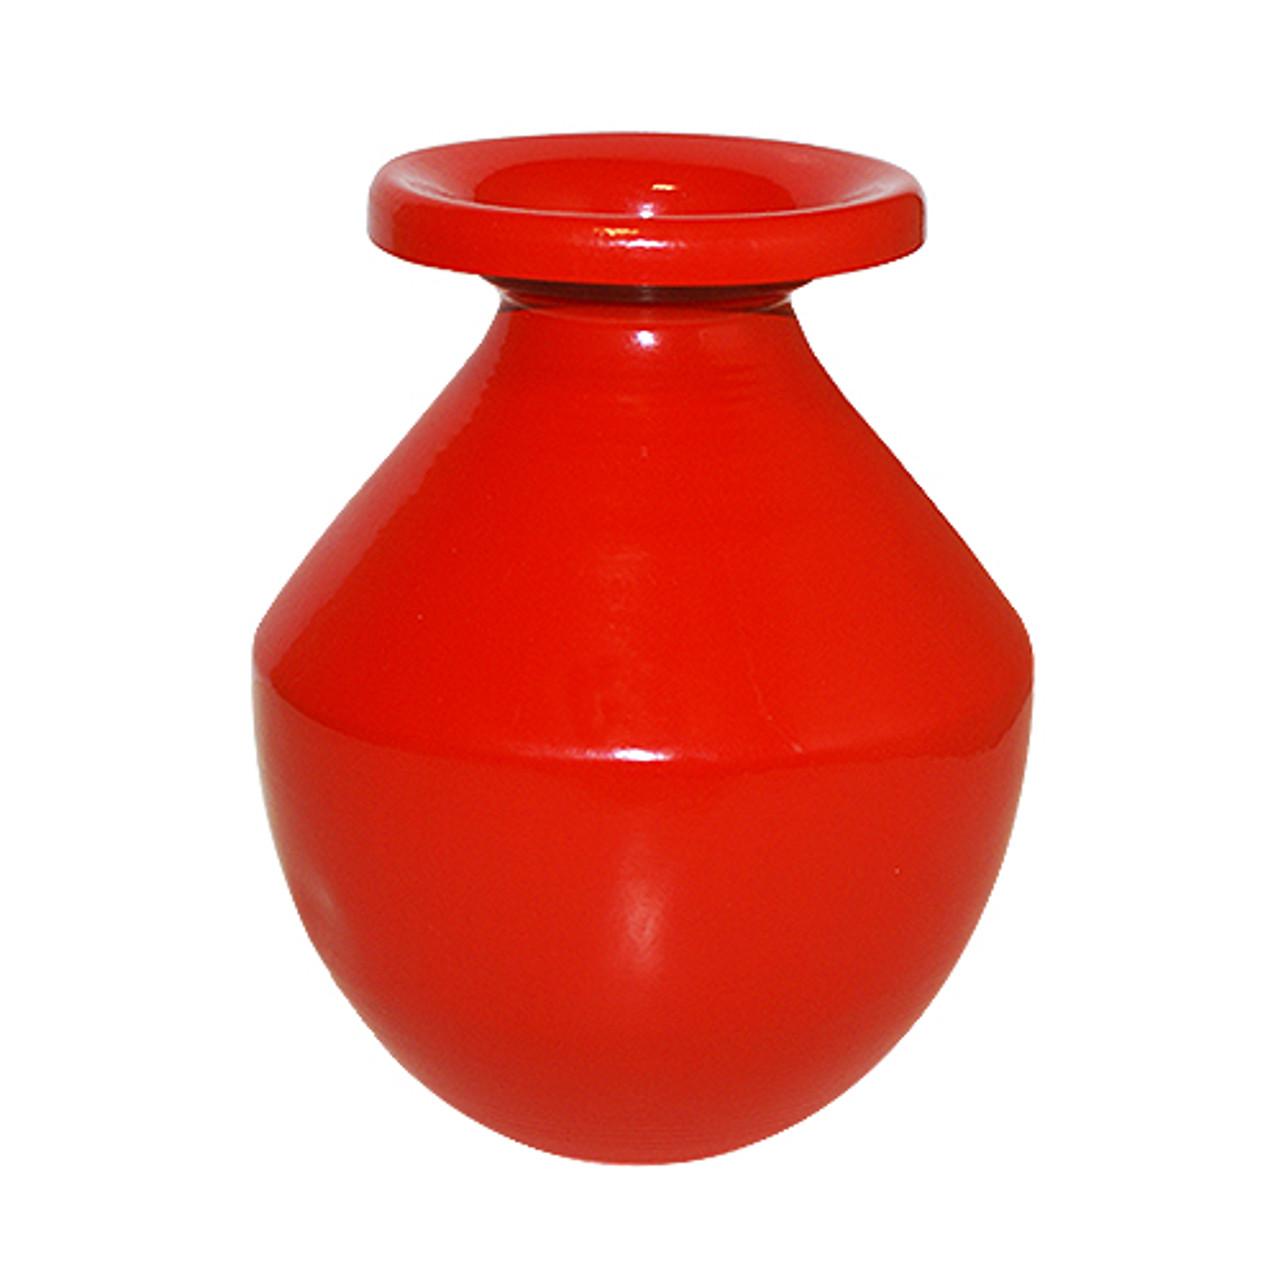 Red Lota Vase Magic Trick Water